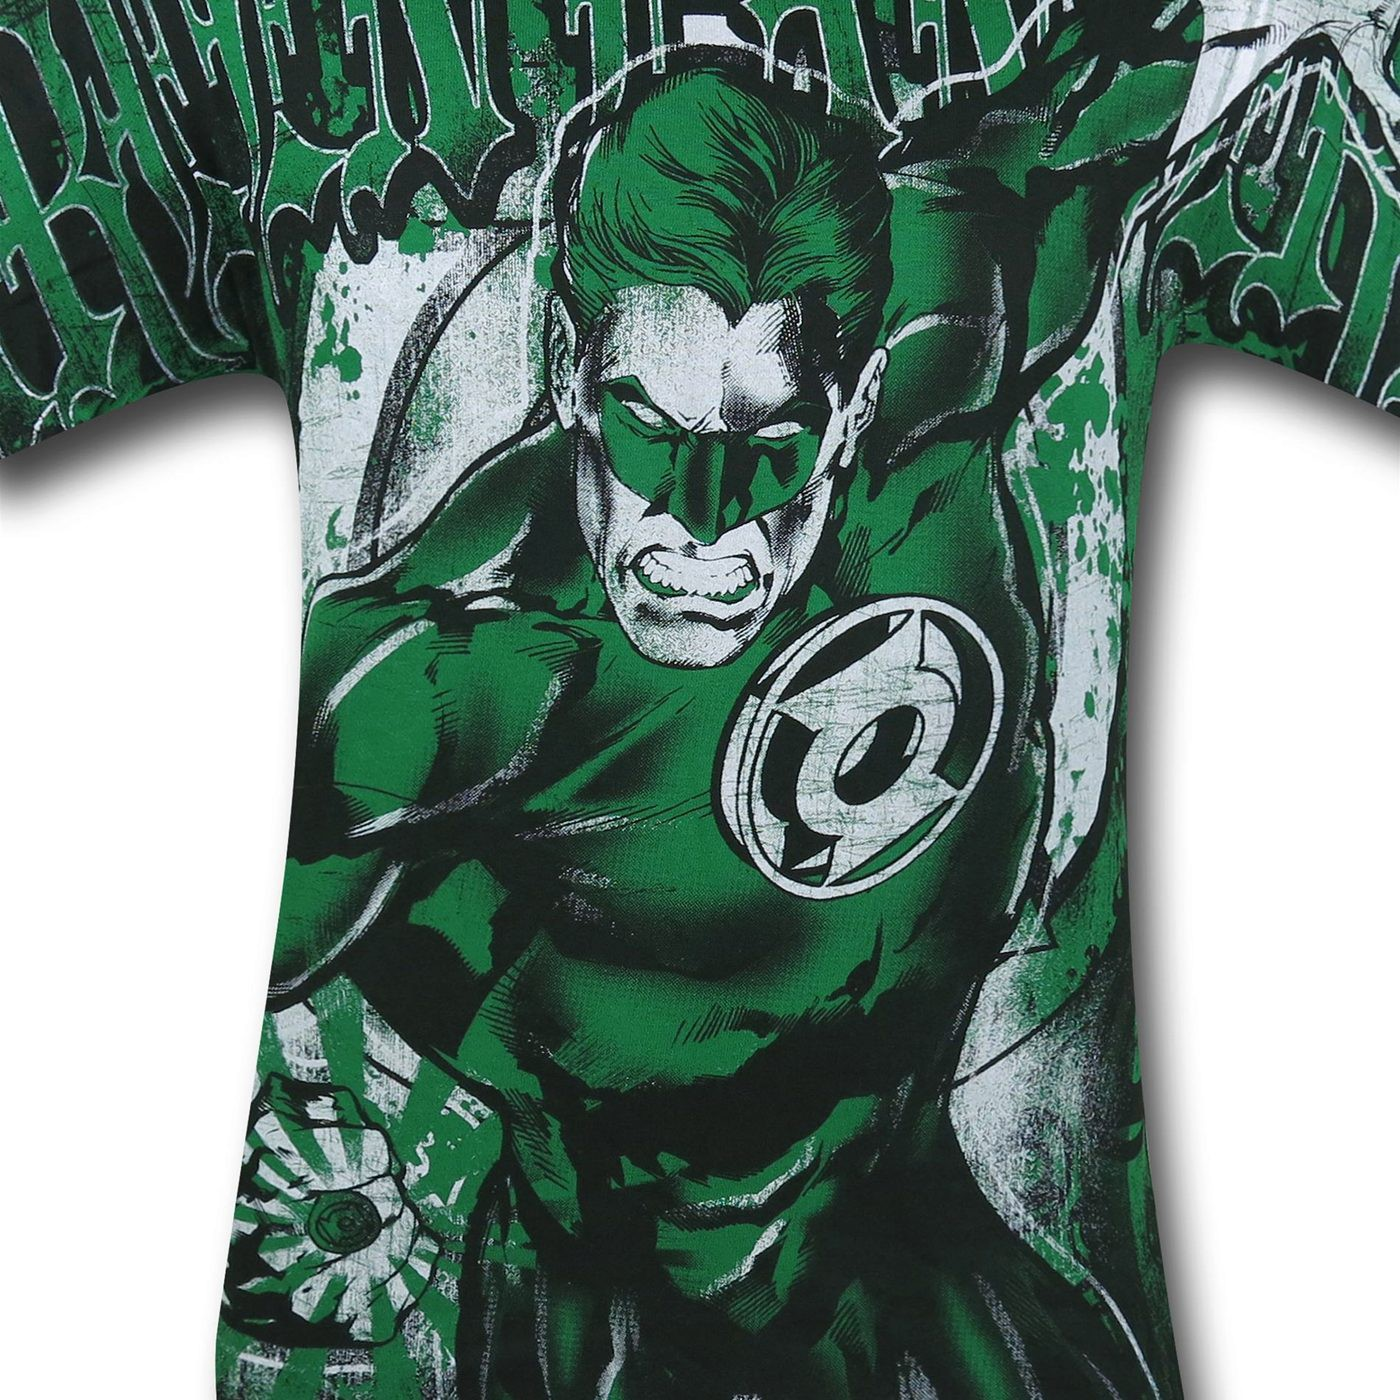 Green Lantern All Over Gothic Print T-Shirt